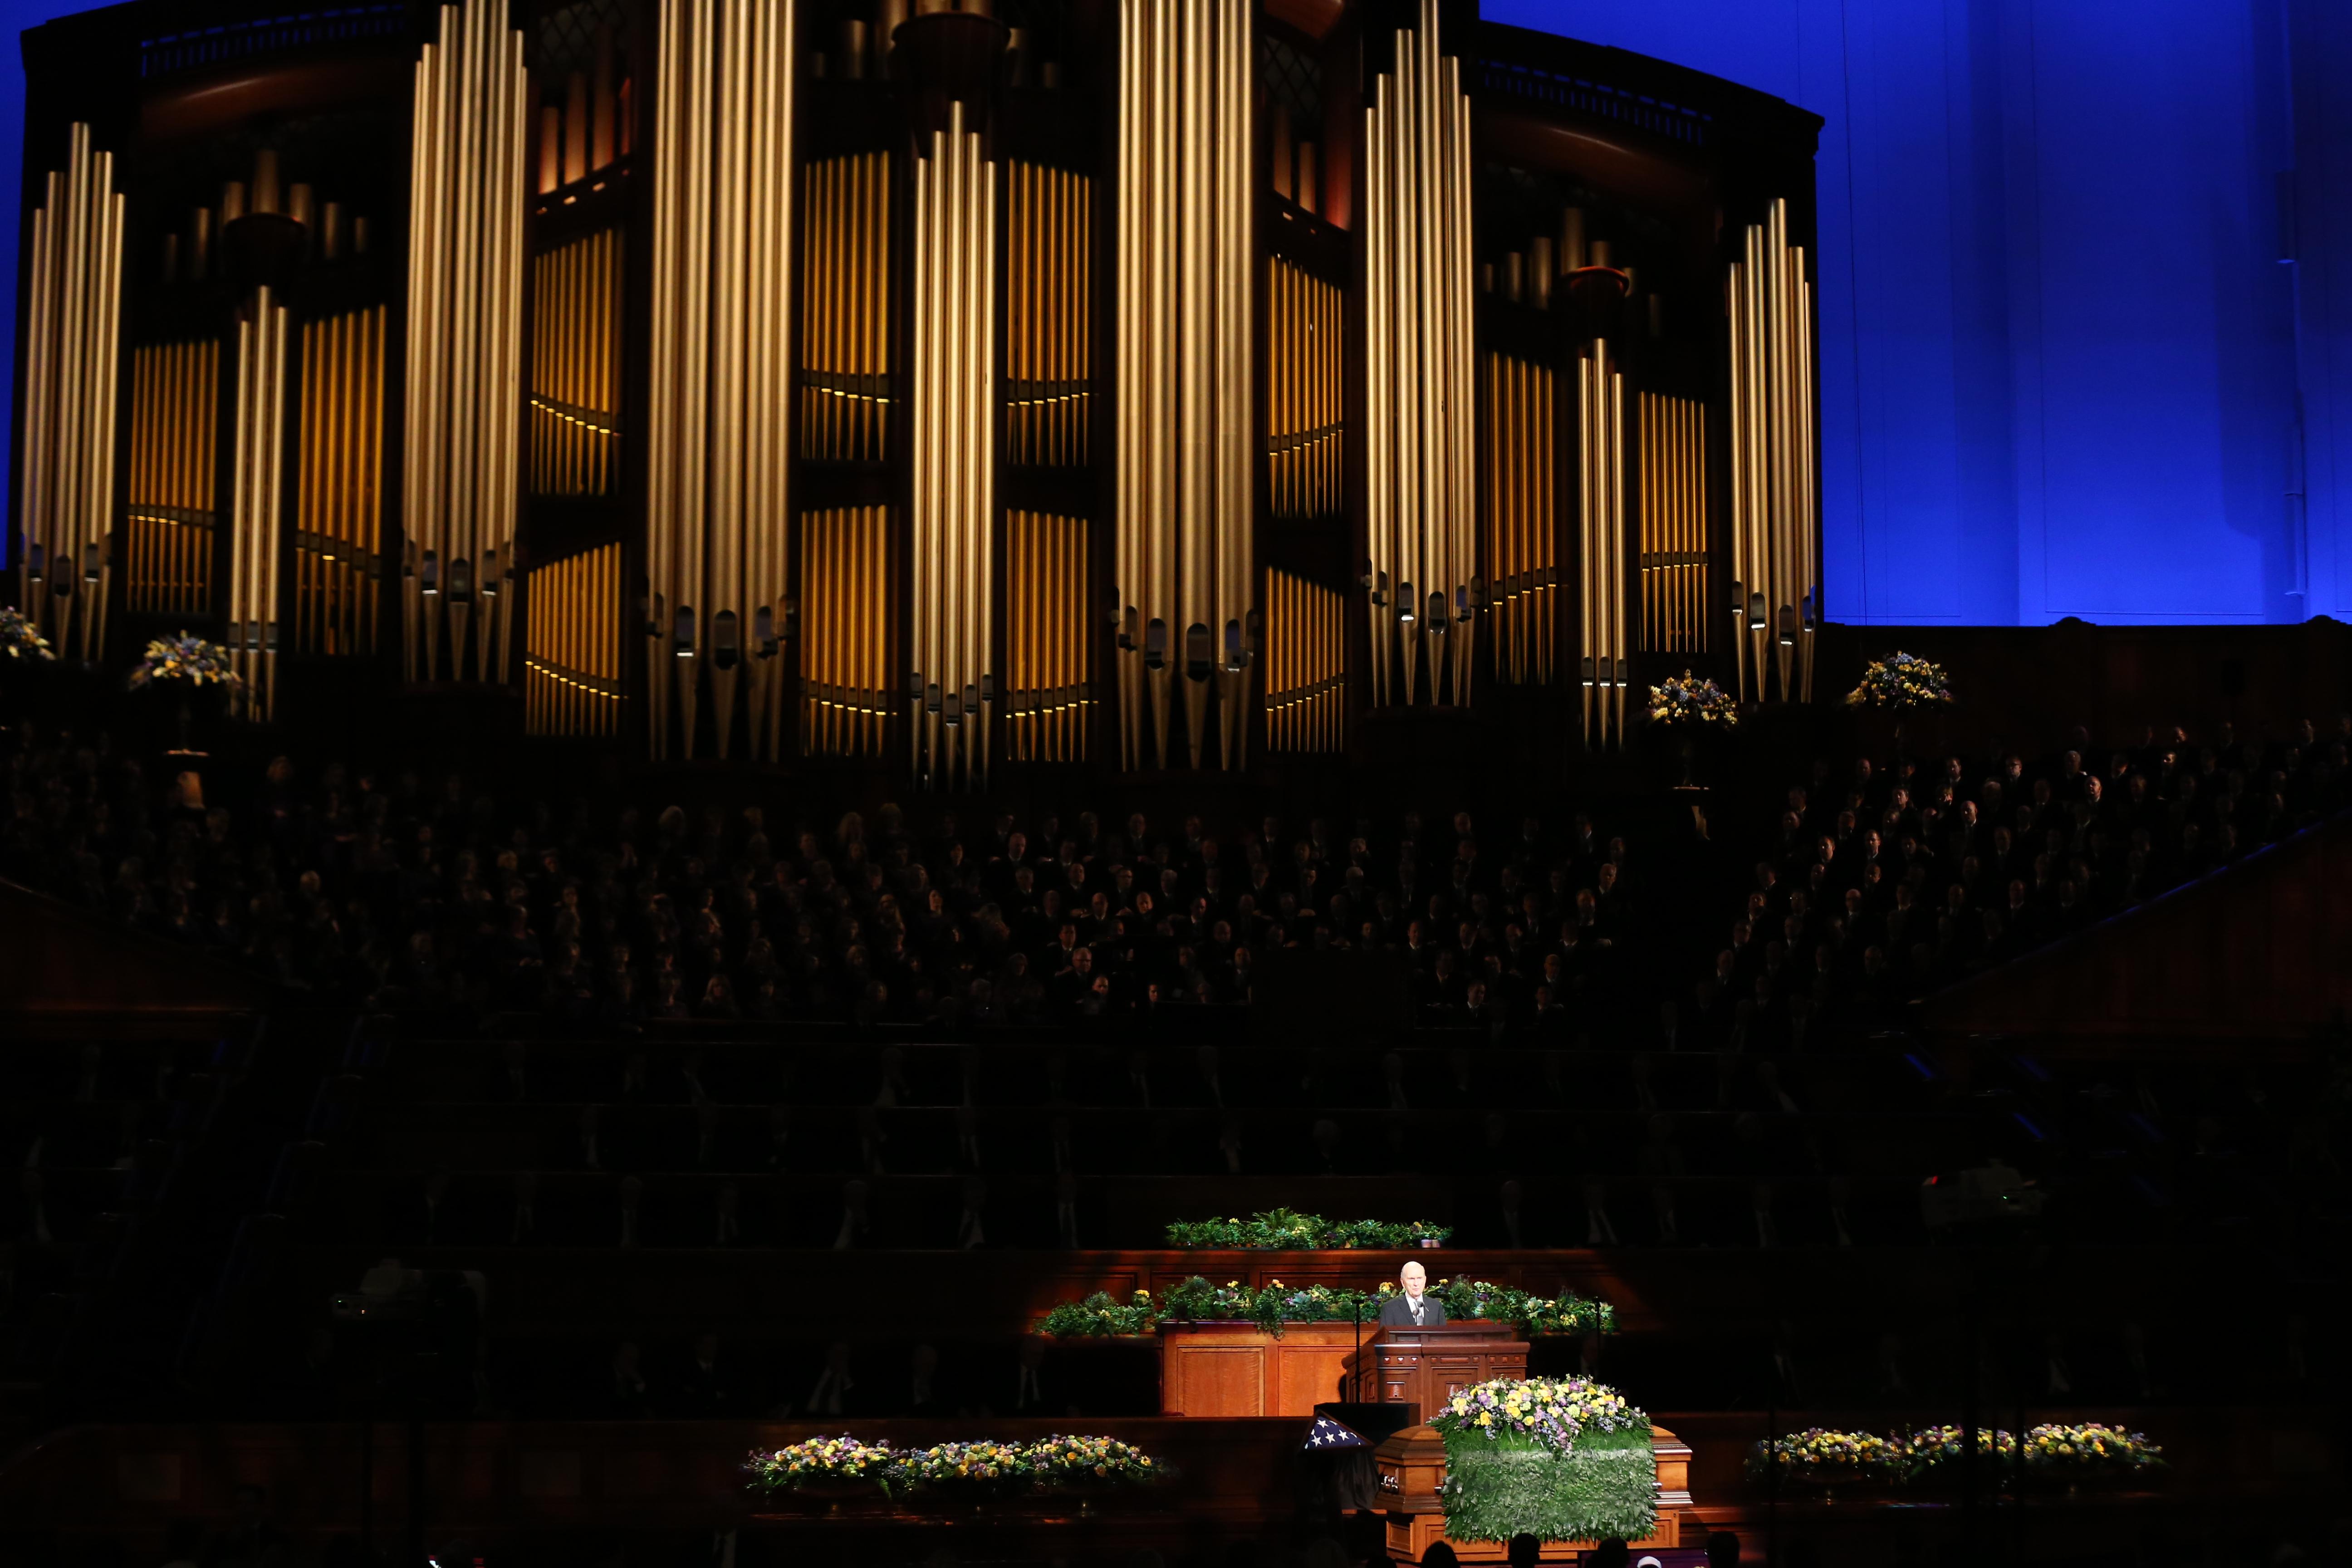 President Russell M. Nelson, president of the Church's Quorum of the Twelve Apostles, speaks at President Thomas S. Monson's funeral at the Conference Center in Salt Lake City on Friday, Jan. 12, 2018.